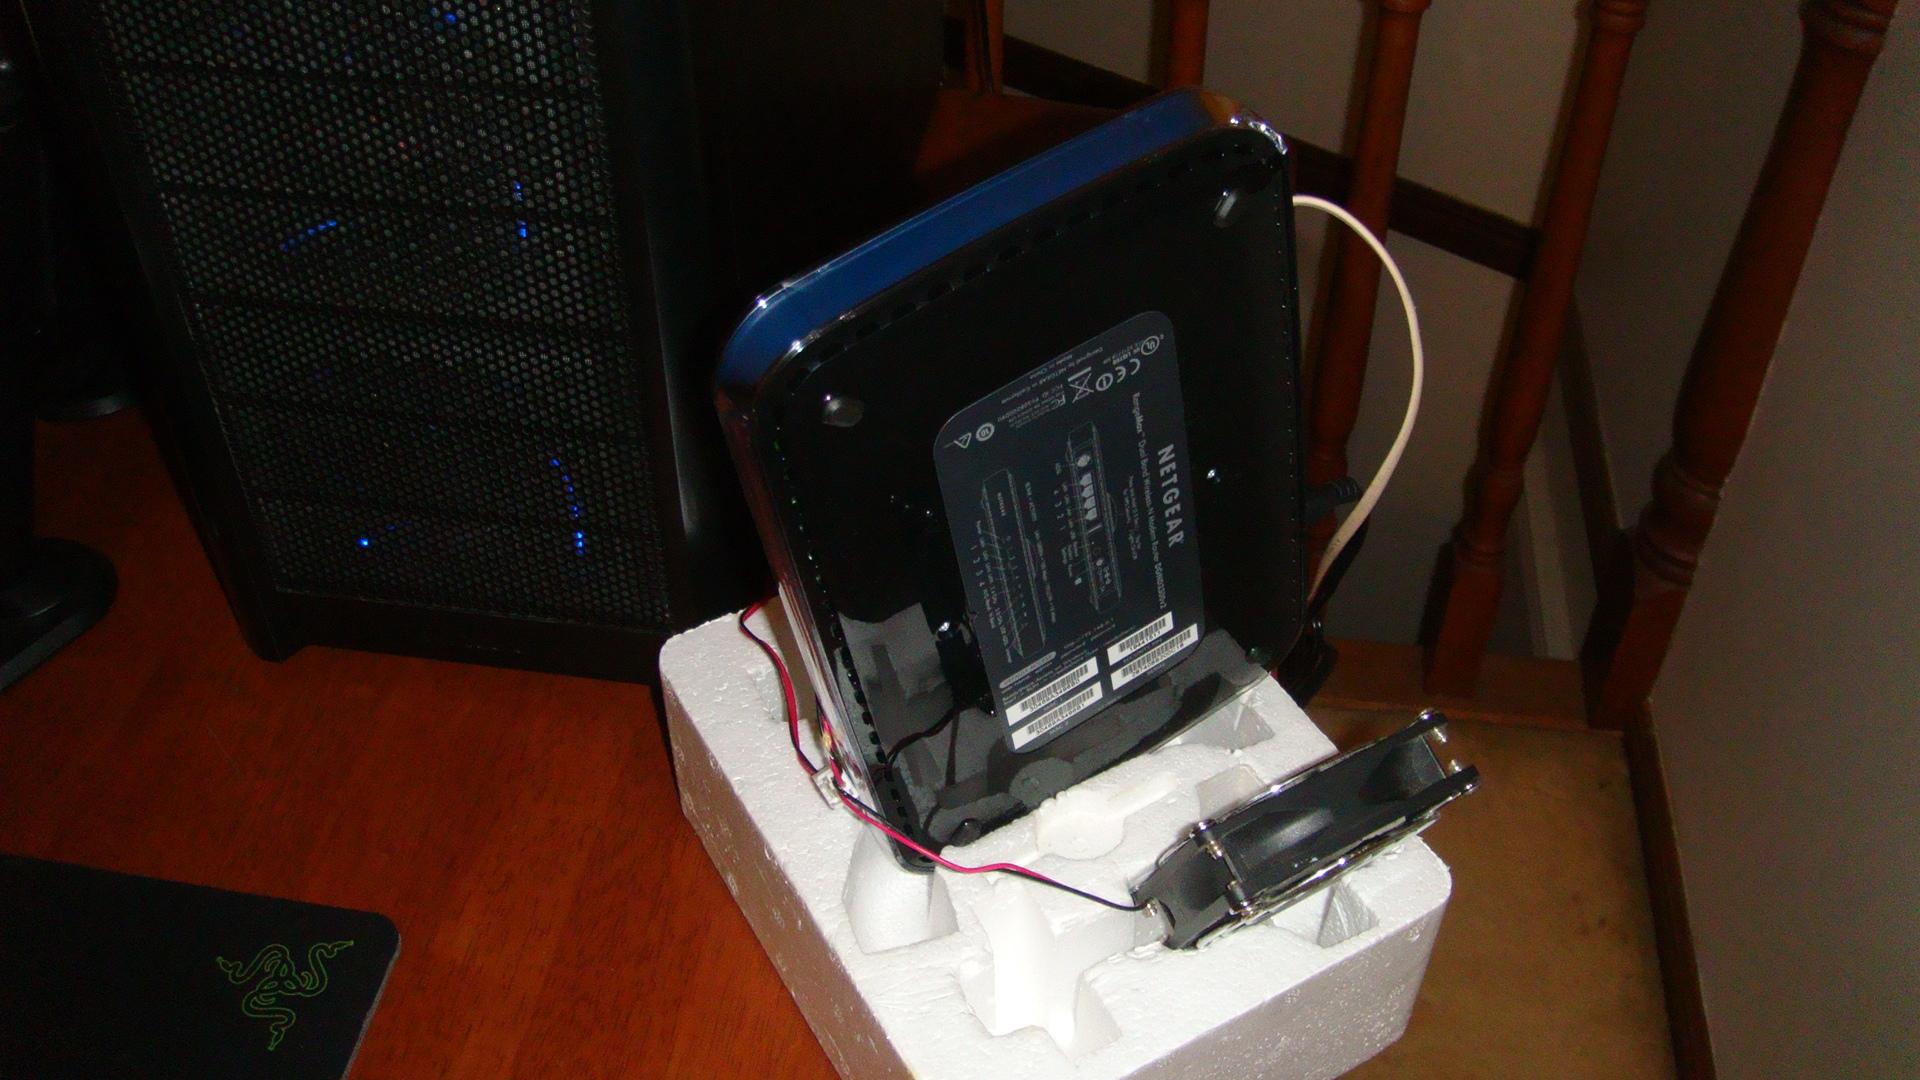 Picture of Netgear Dgnd3300 Modem/router Cooling Fans Mod (does Not Void Manufacturer Warranty)